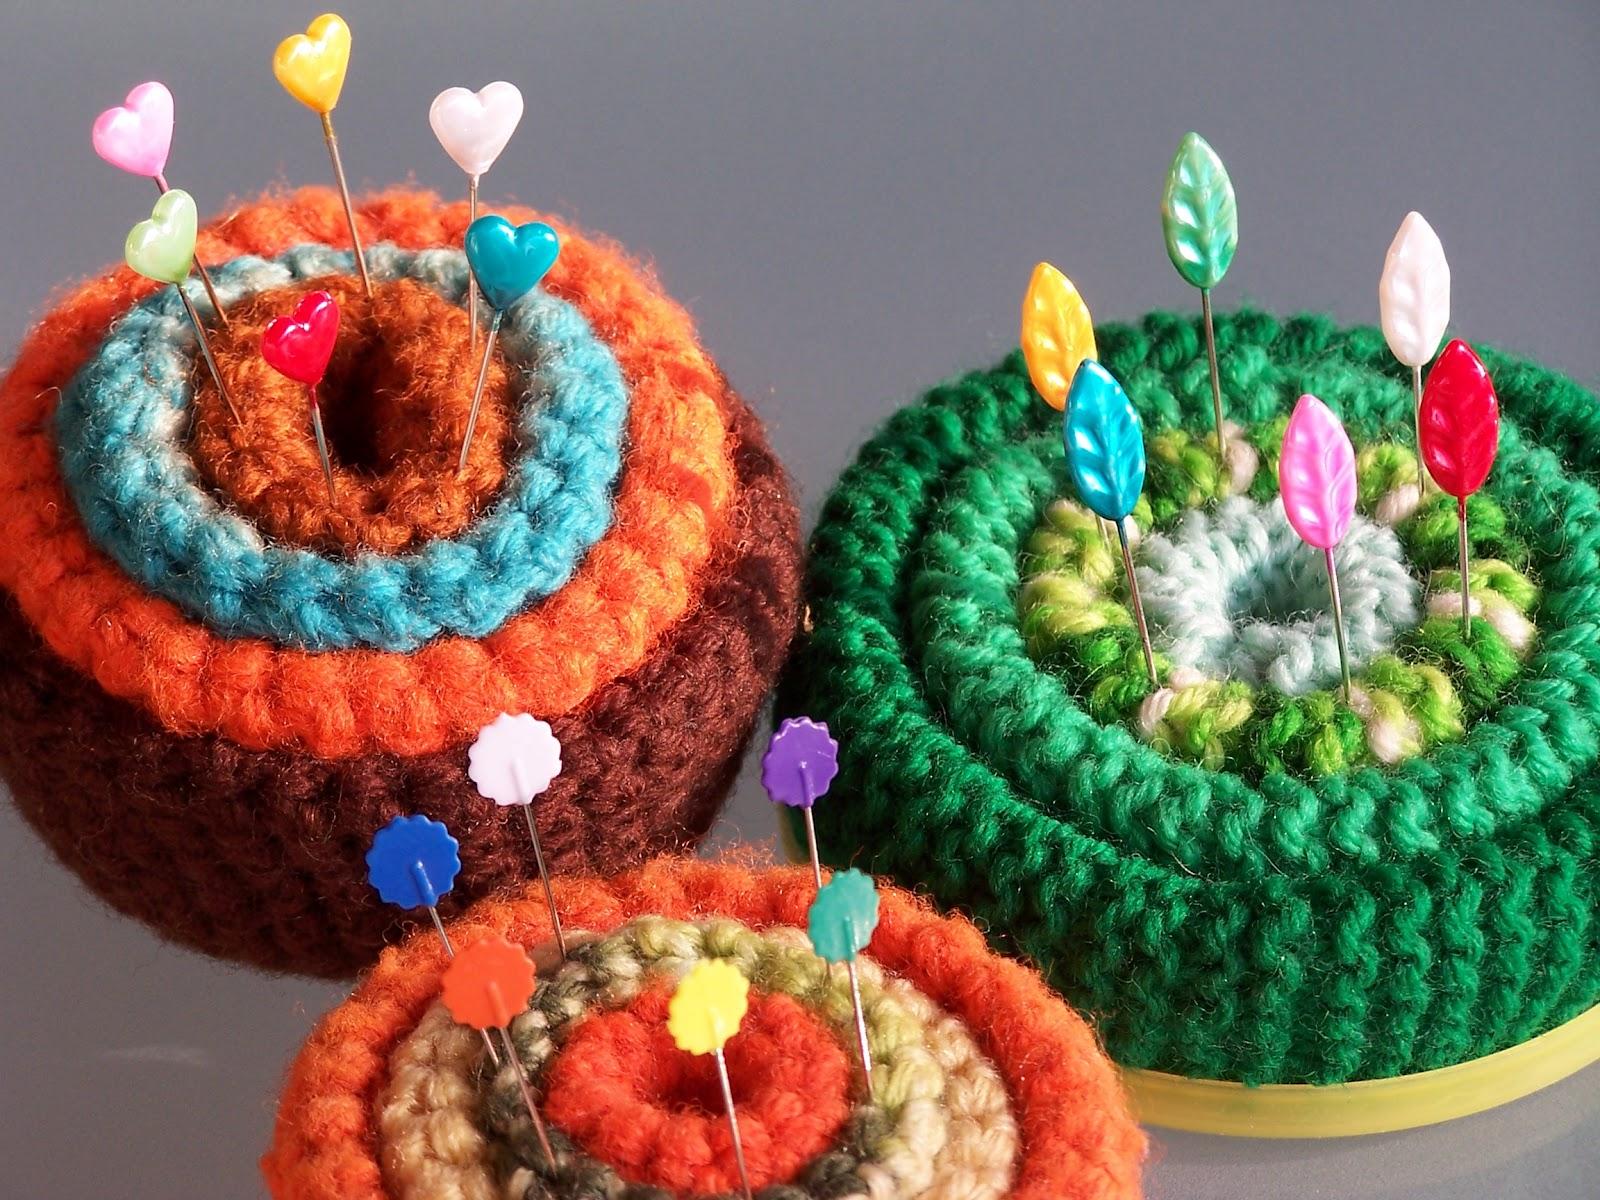 Knitting Pattern Pin Cushion : Reminisce...: vintage knitted pincushions